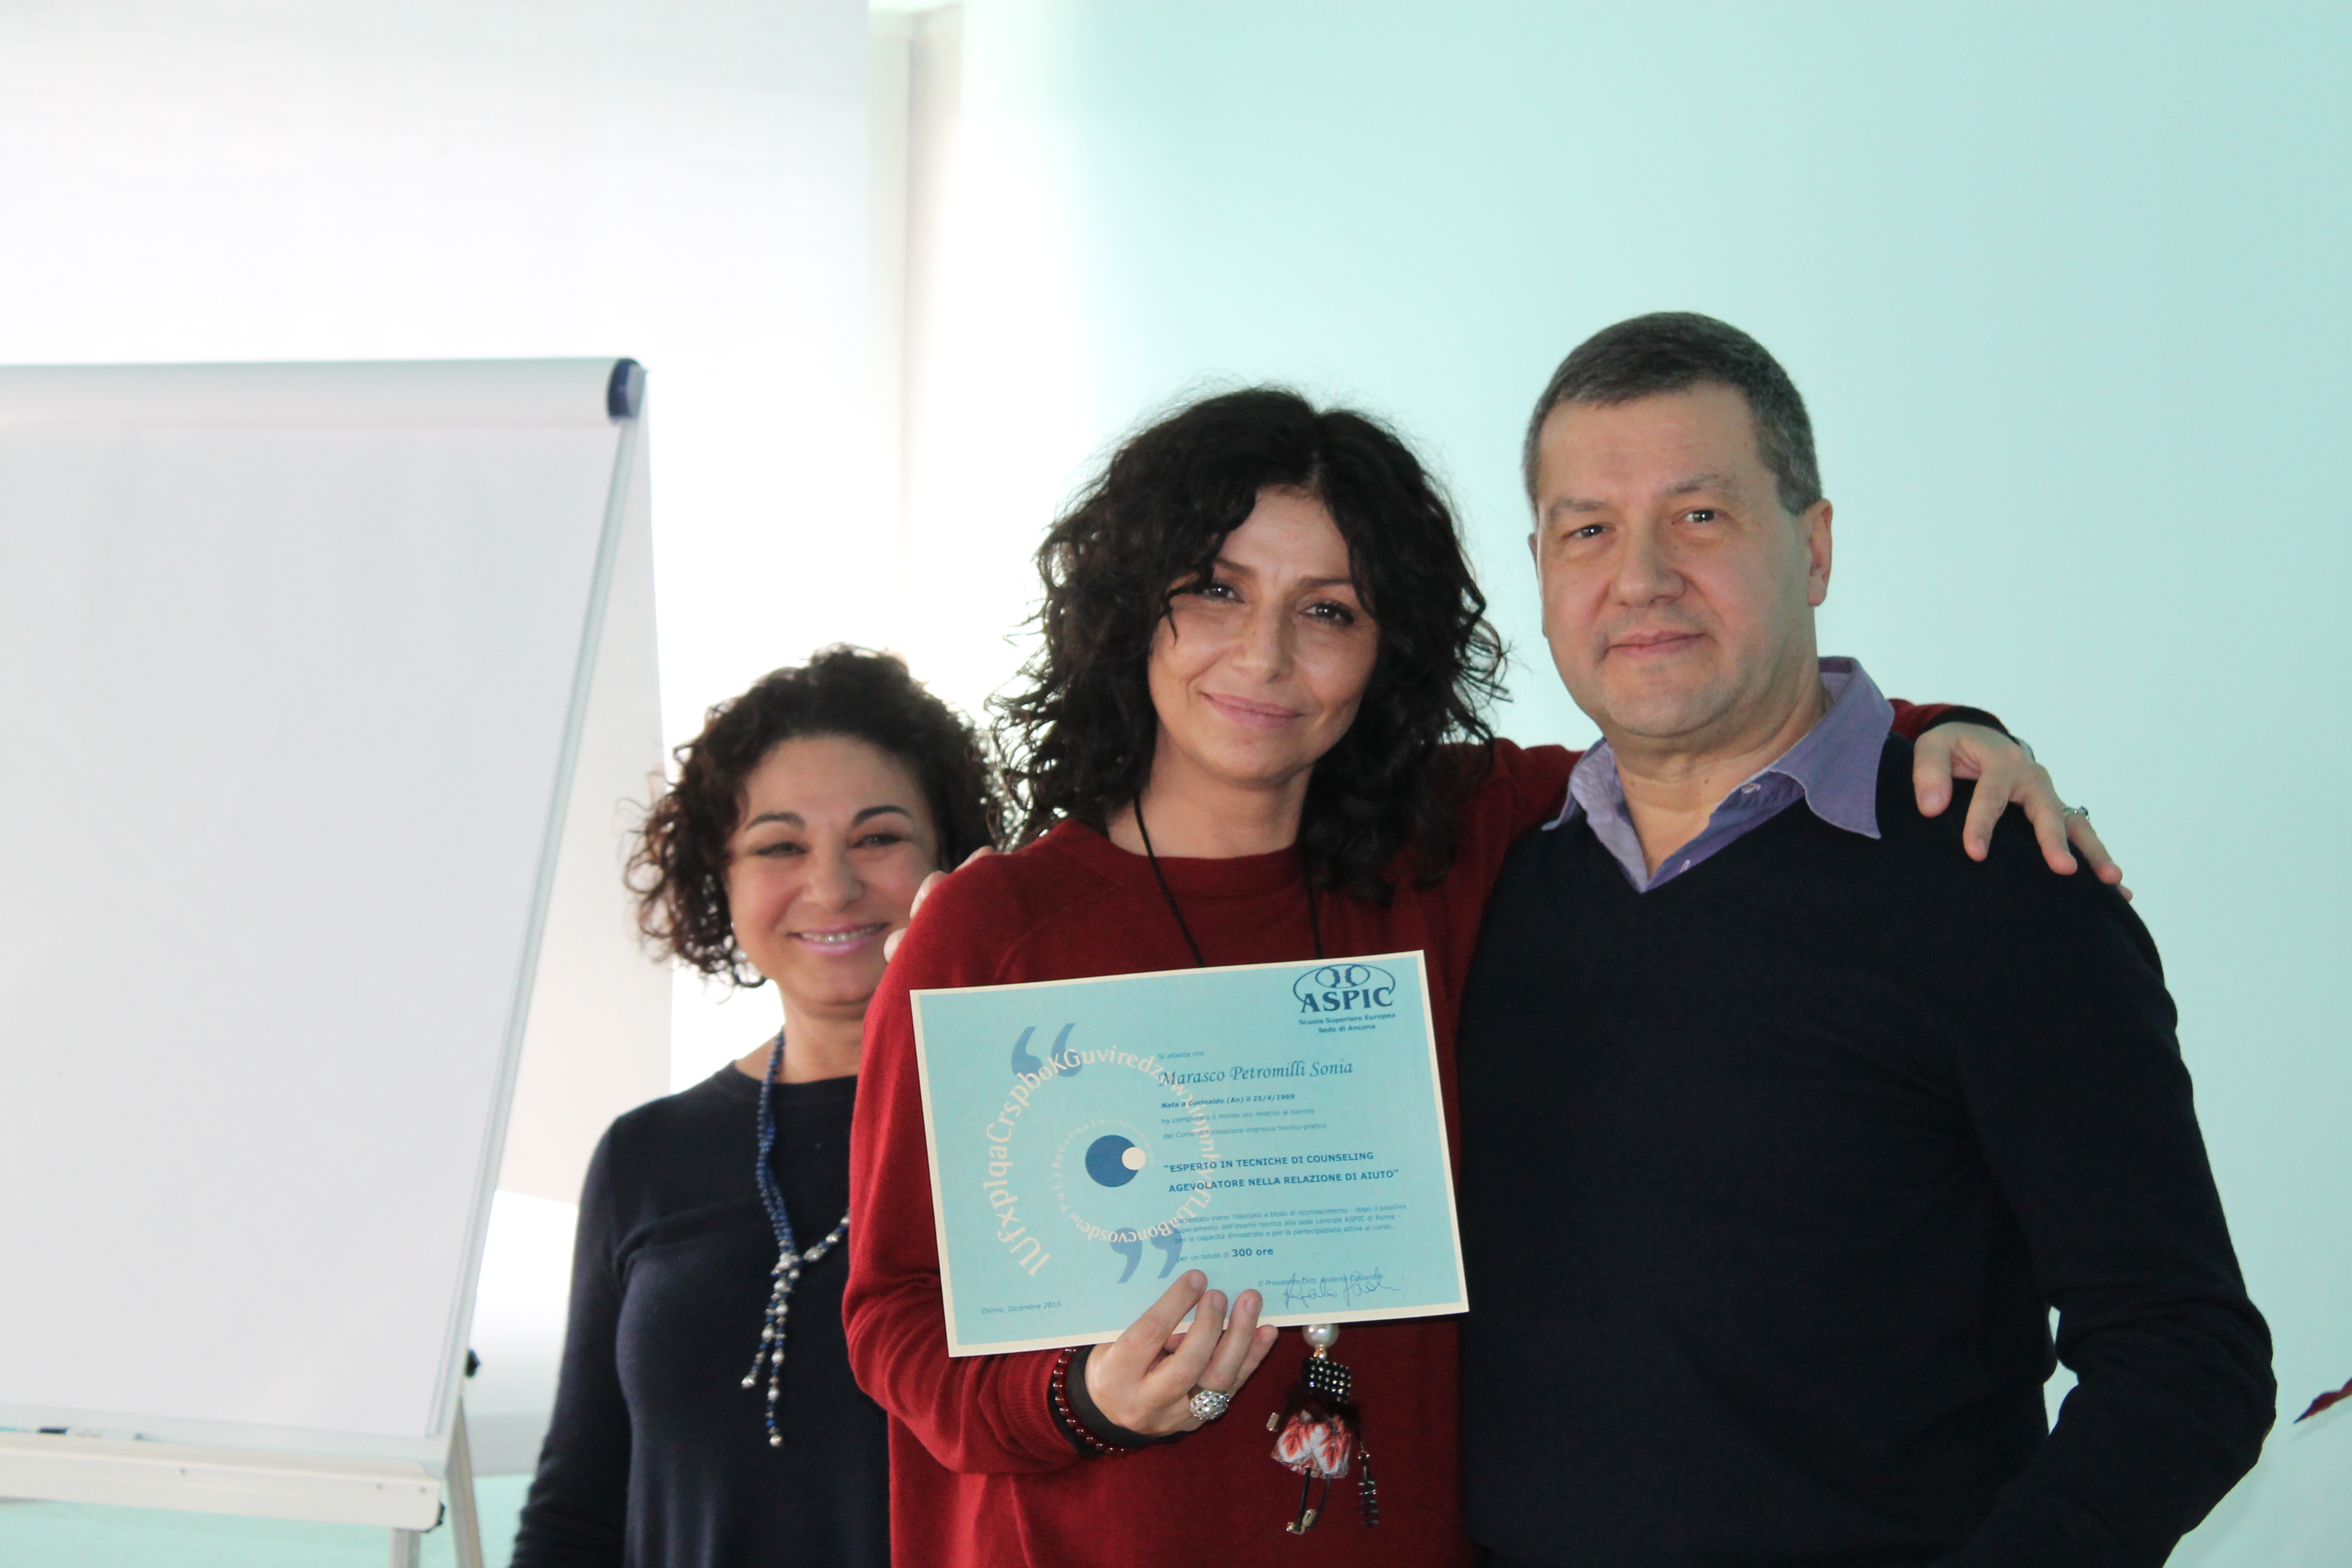 Sonia Marasco Petromilli